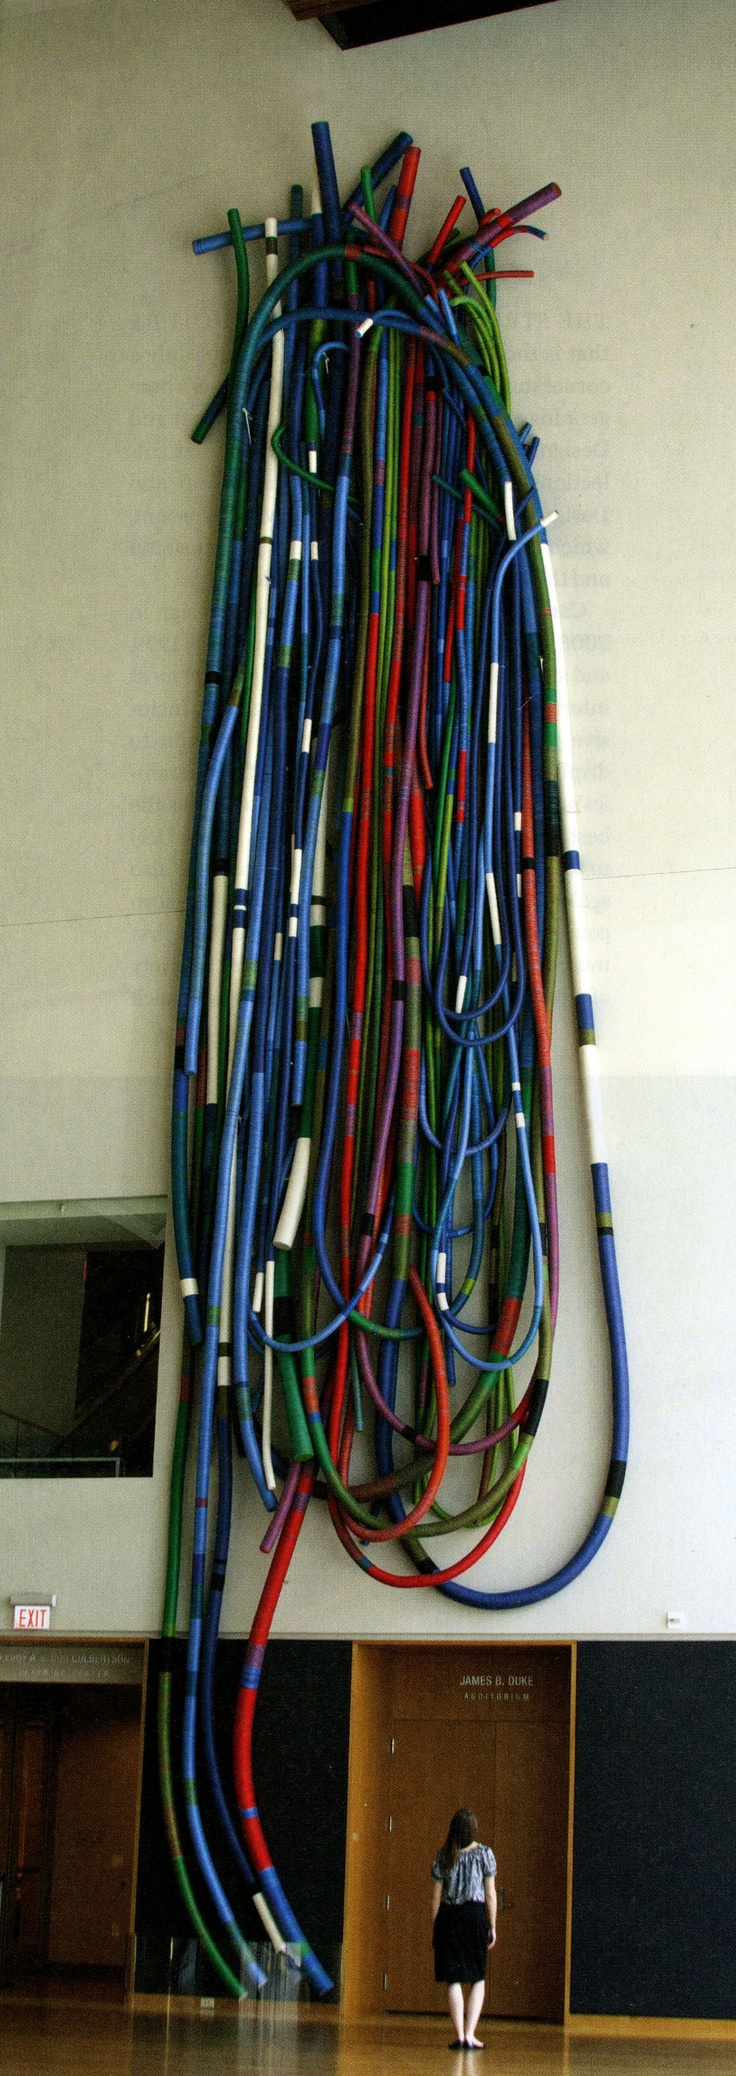 Sheila Hicks linen and cork sculpture MEGA FOOTPRINT NEAR HUTCH ( May I Have This Dance?) 2002-2003